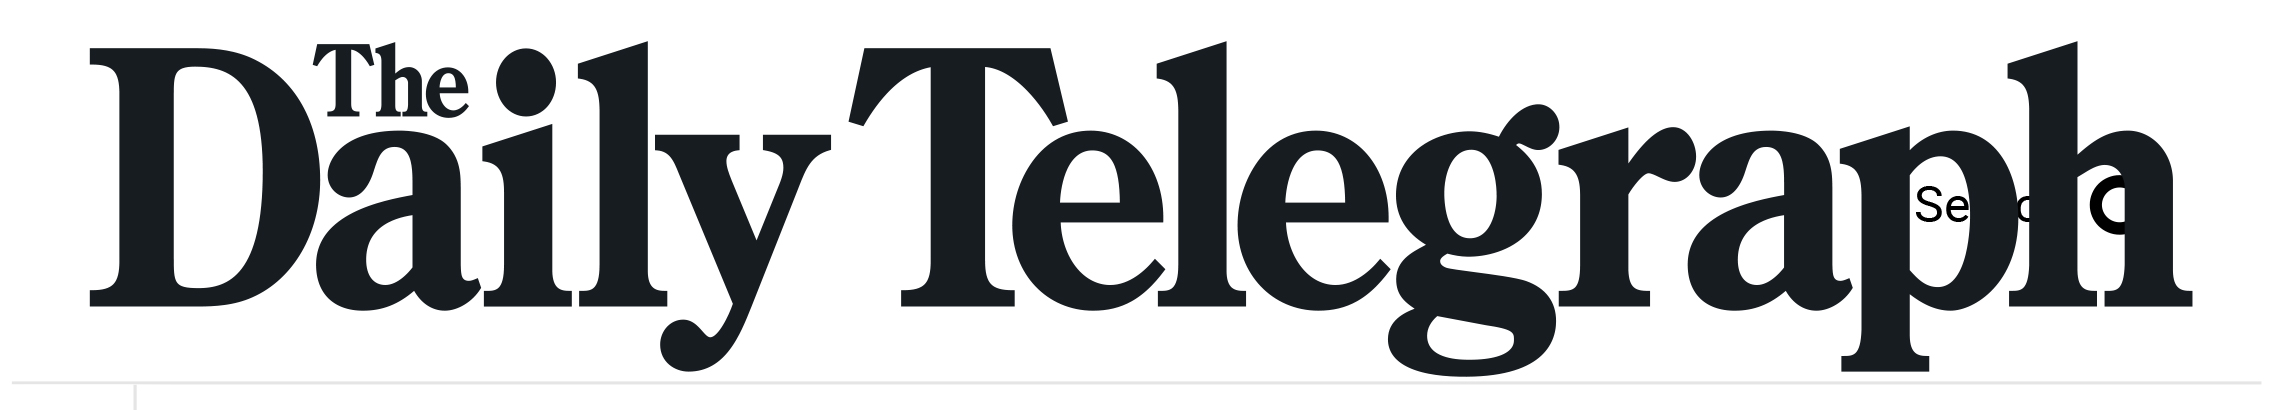 Daily Telegraph _logo.jpg